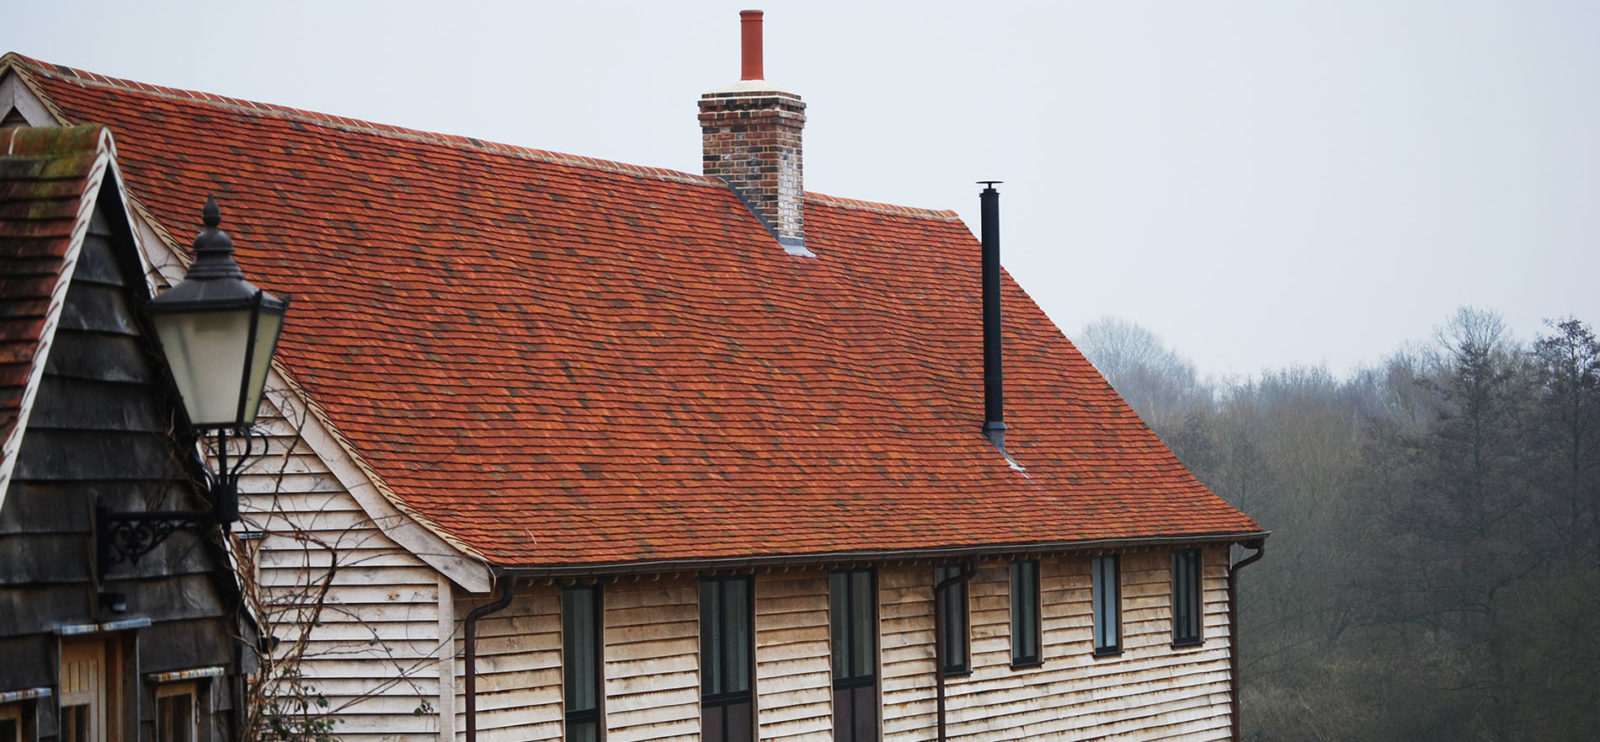 Lifestiles - Handmade Multi Clay Roof Tiles - Sible, England